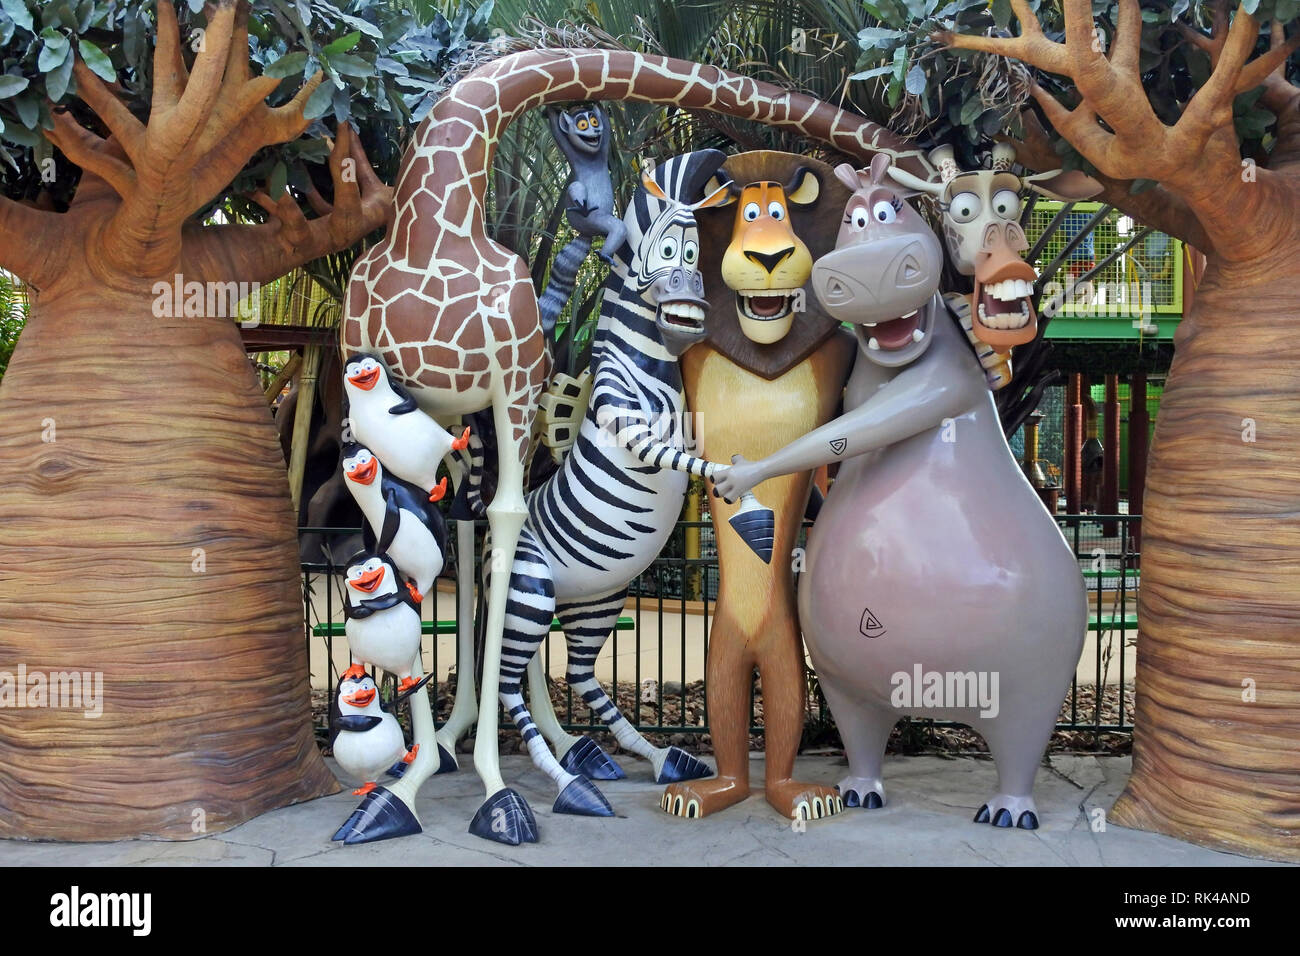 Madagascar film characters at Dreamworld, Gold Coast, Australia. The film grossed over $603 million worldwide. - Stock Image